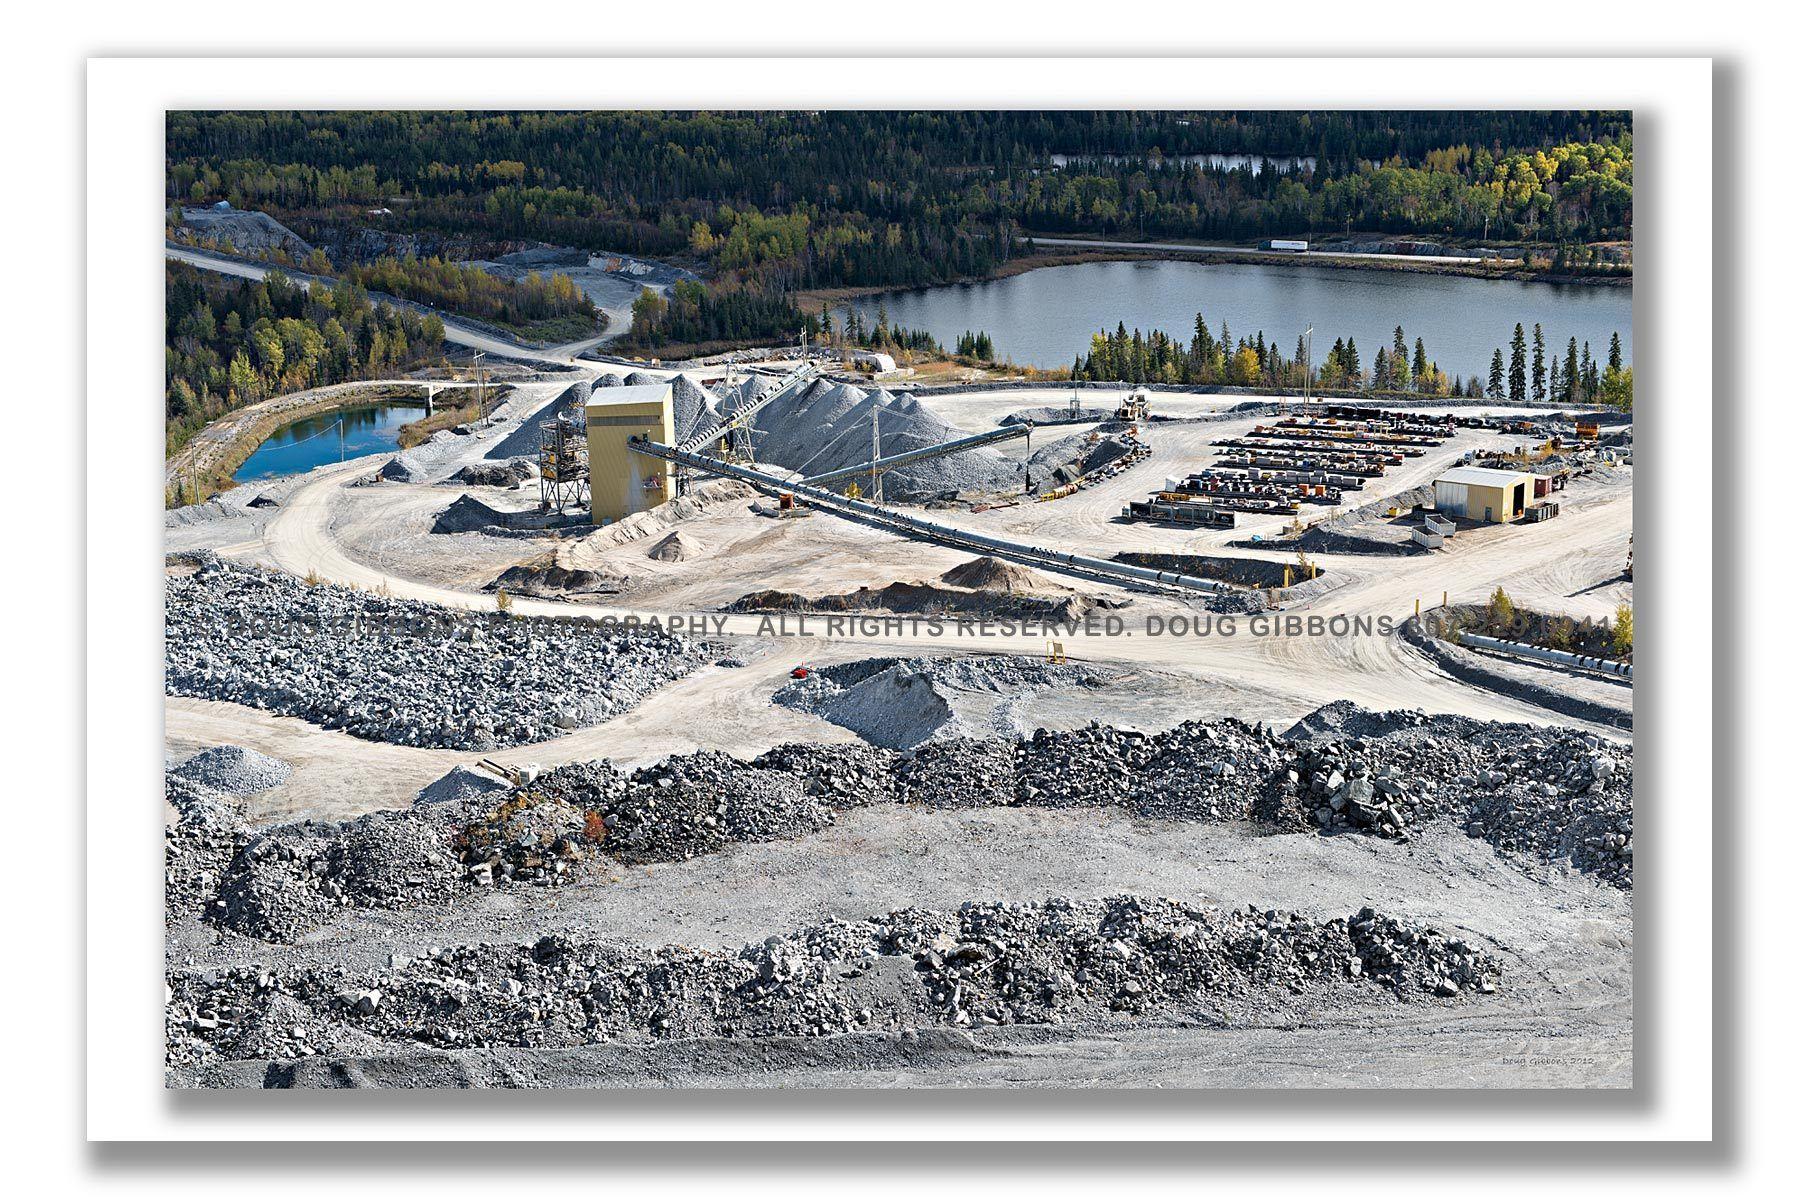 Rock crushing at Williams Mine